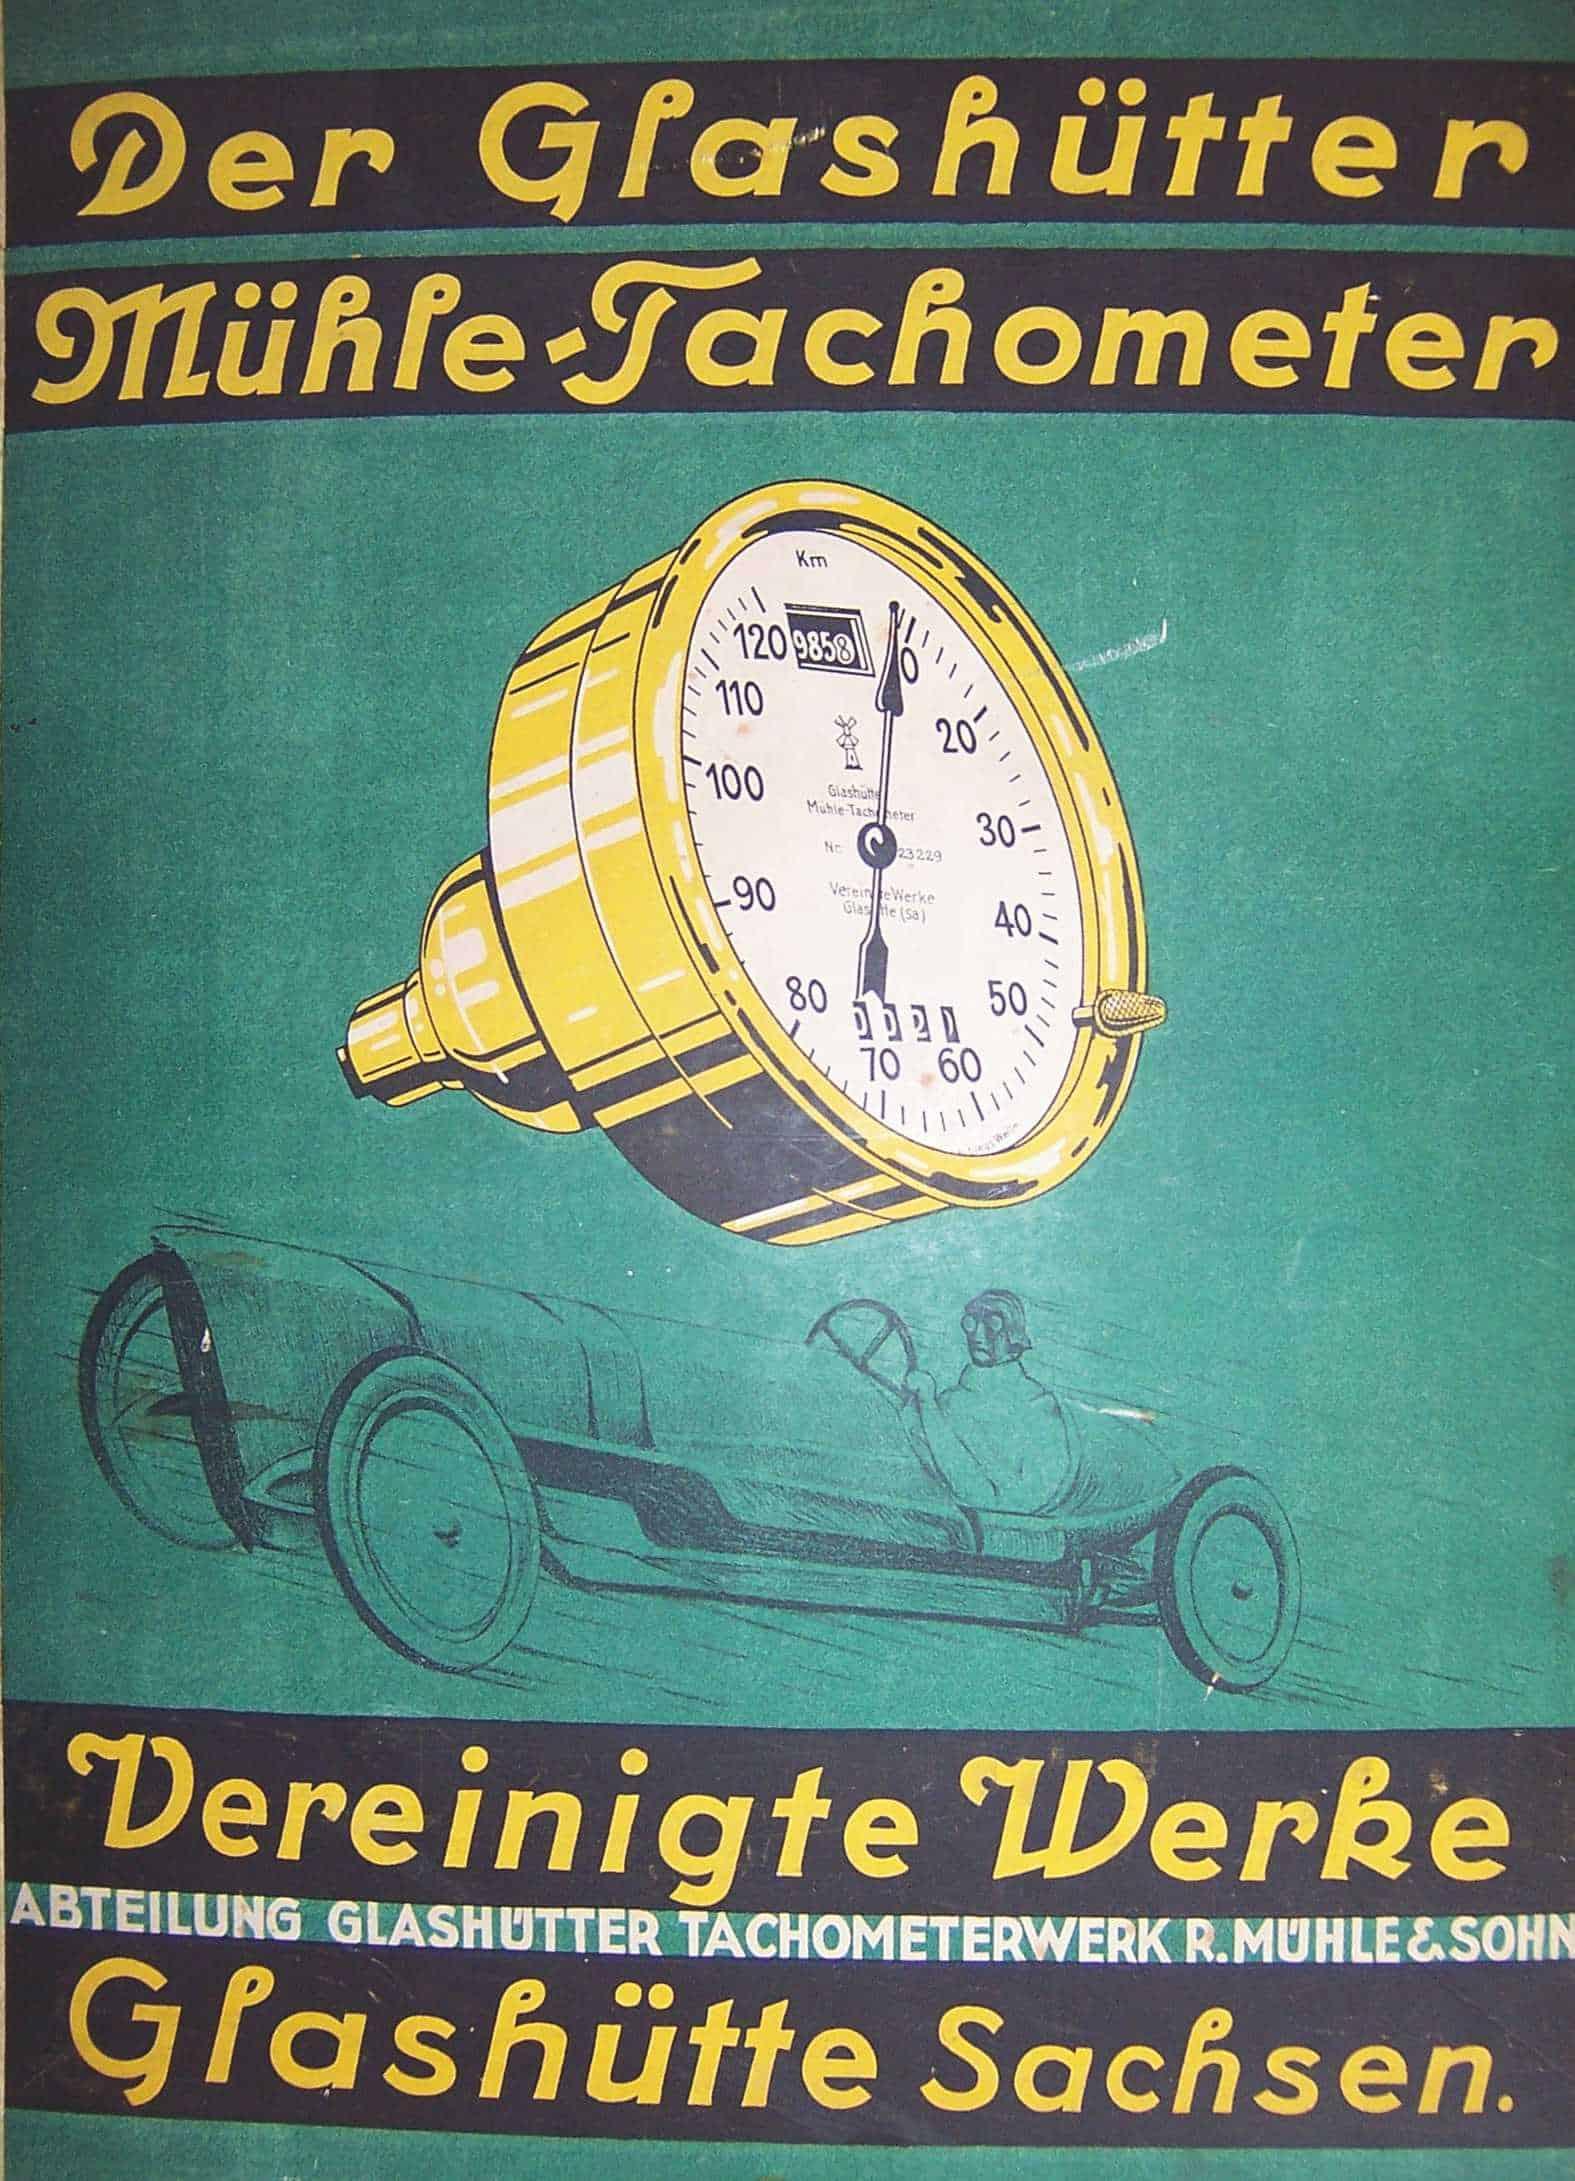 Glashütter Mühle Tachometer - 1. Mühle Generation